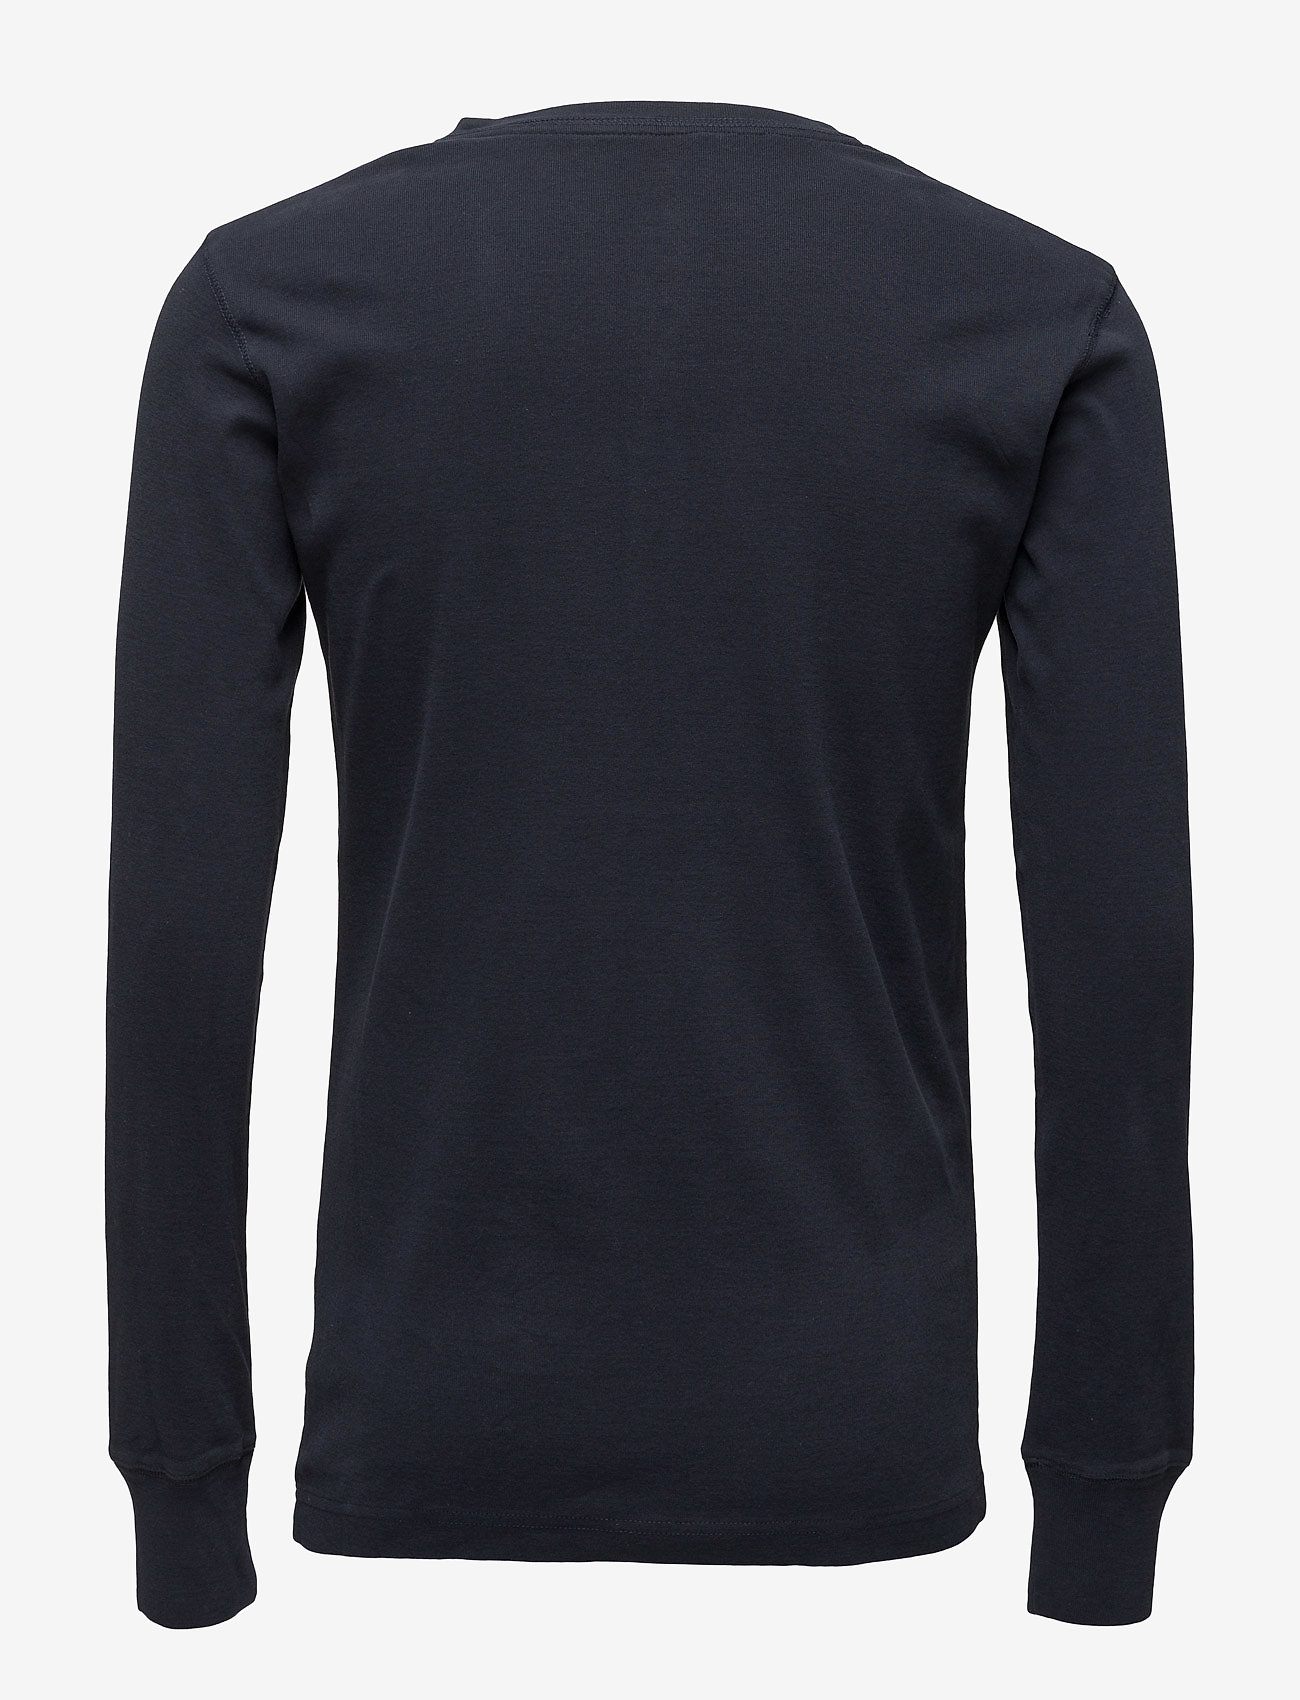 Knowledge Cotton Apparel CEDAR LS Henley - GOTS/Vegan - T-skjorter TOTAL ECLIPSE - Menn Klær